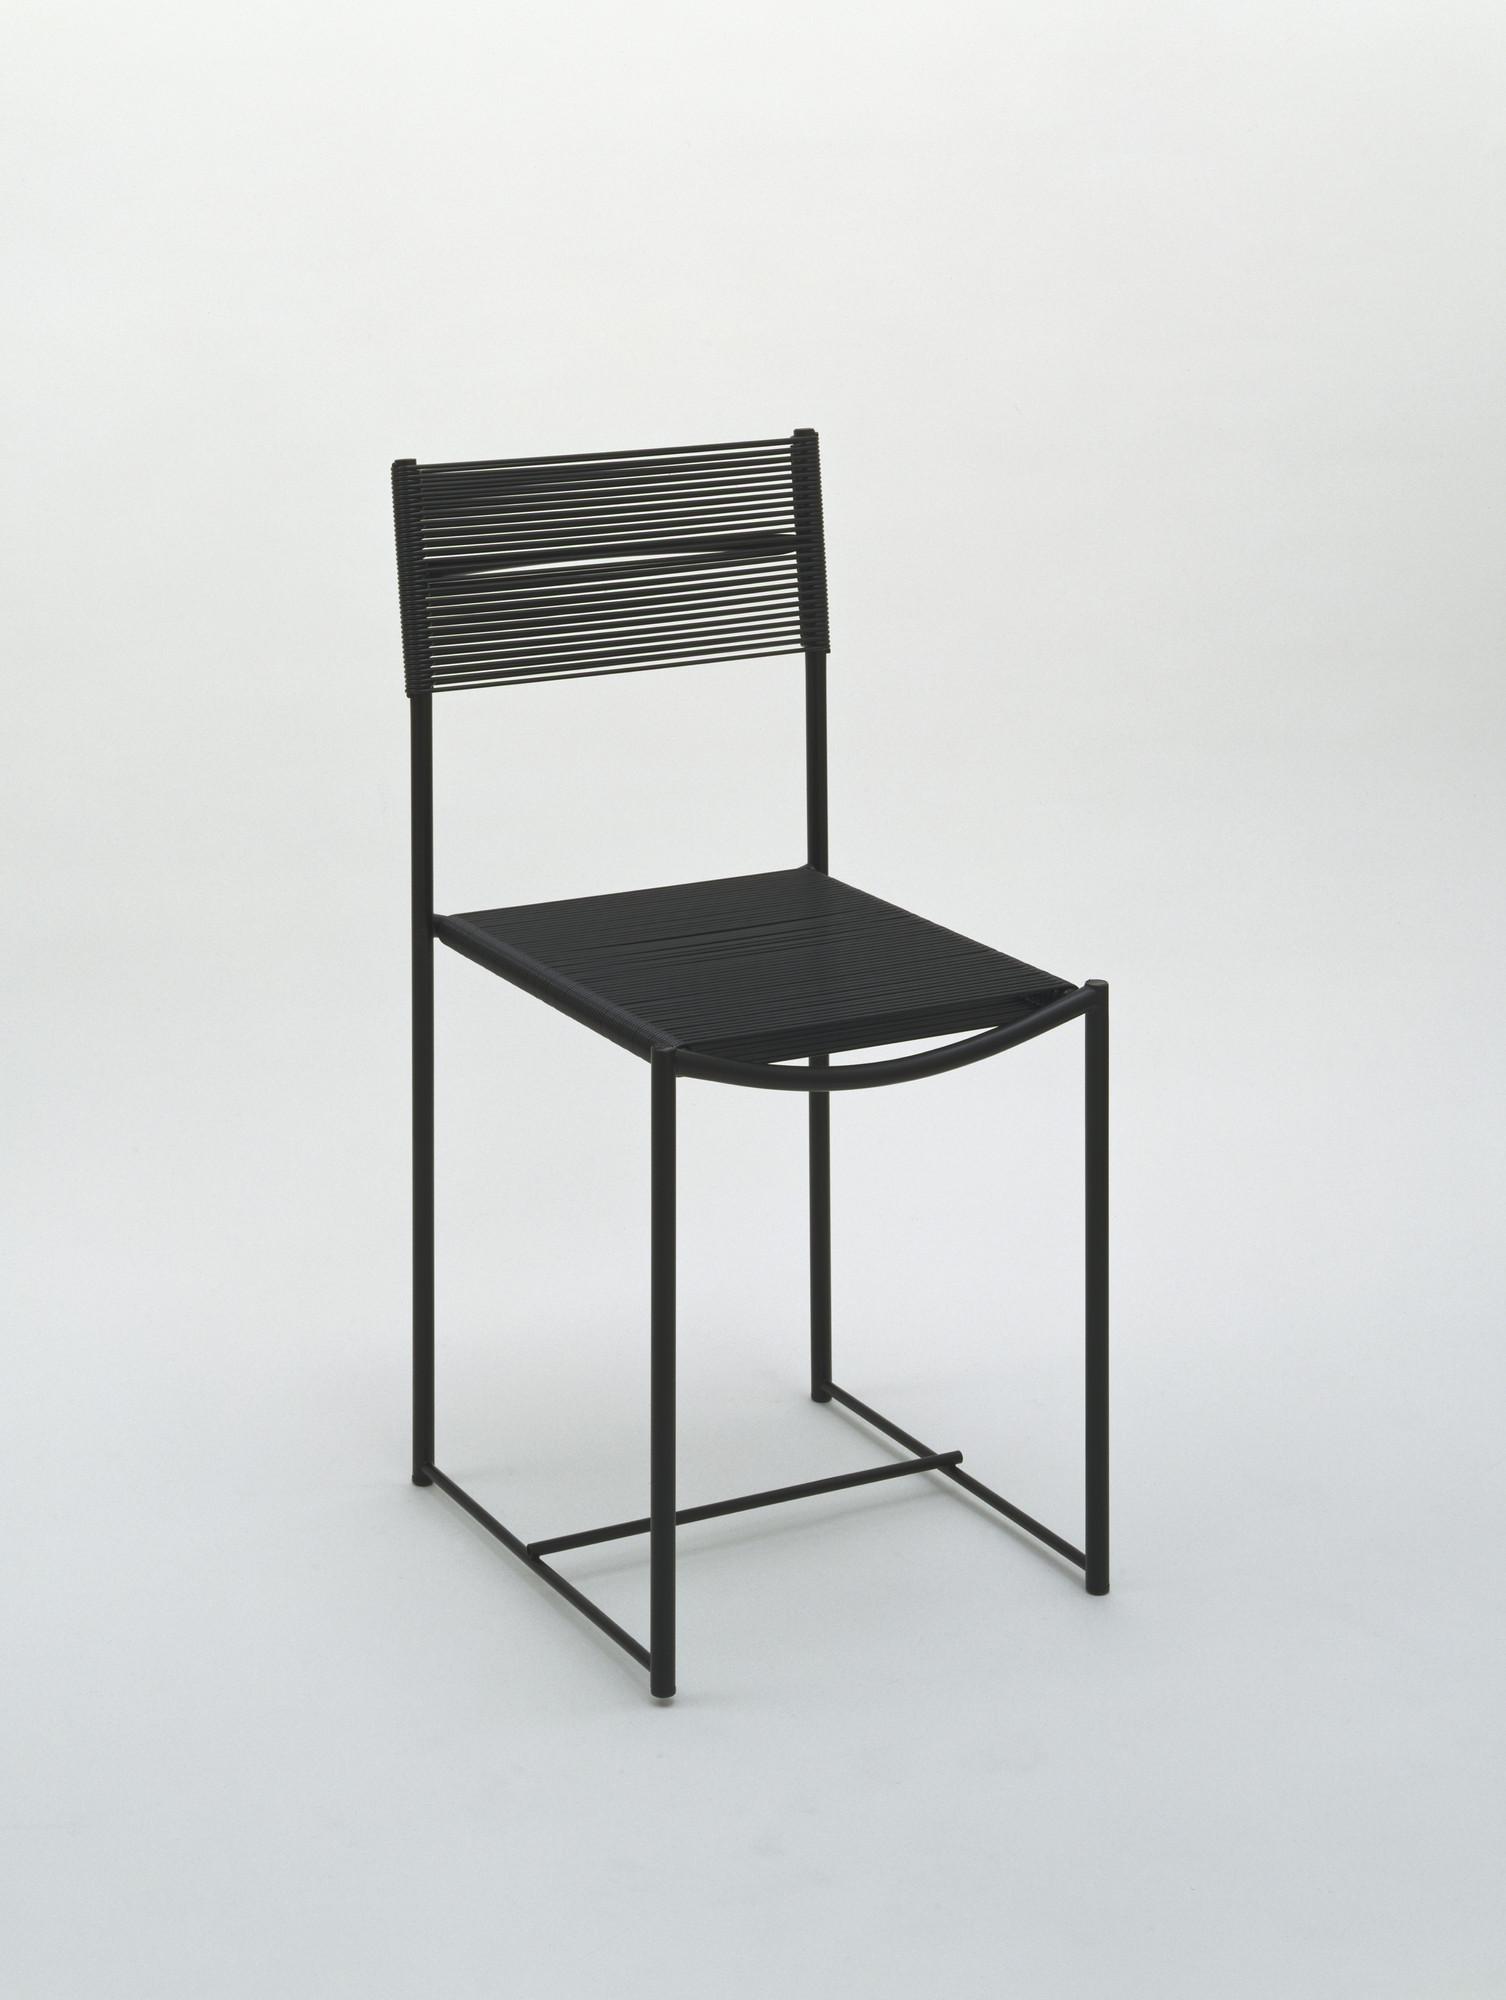 Spaghetti Chair Giandomenico Belotti.Giandomenico Belotti Spaghetti Side Chair 1960 Moma